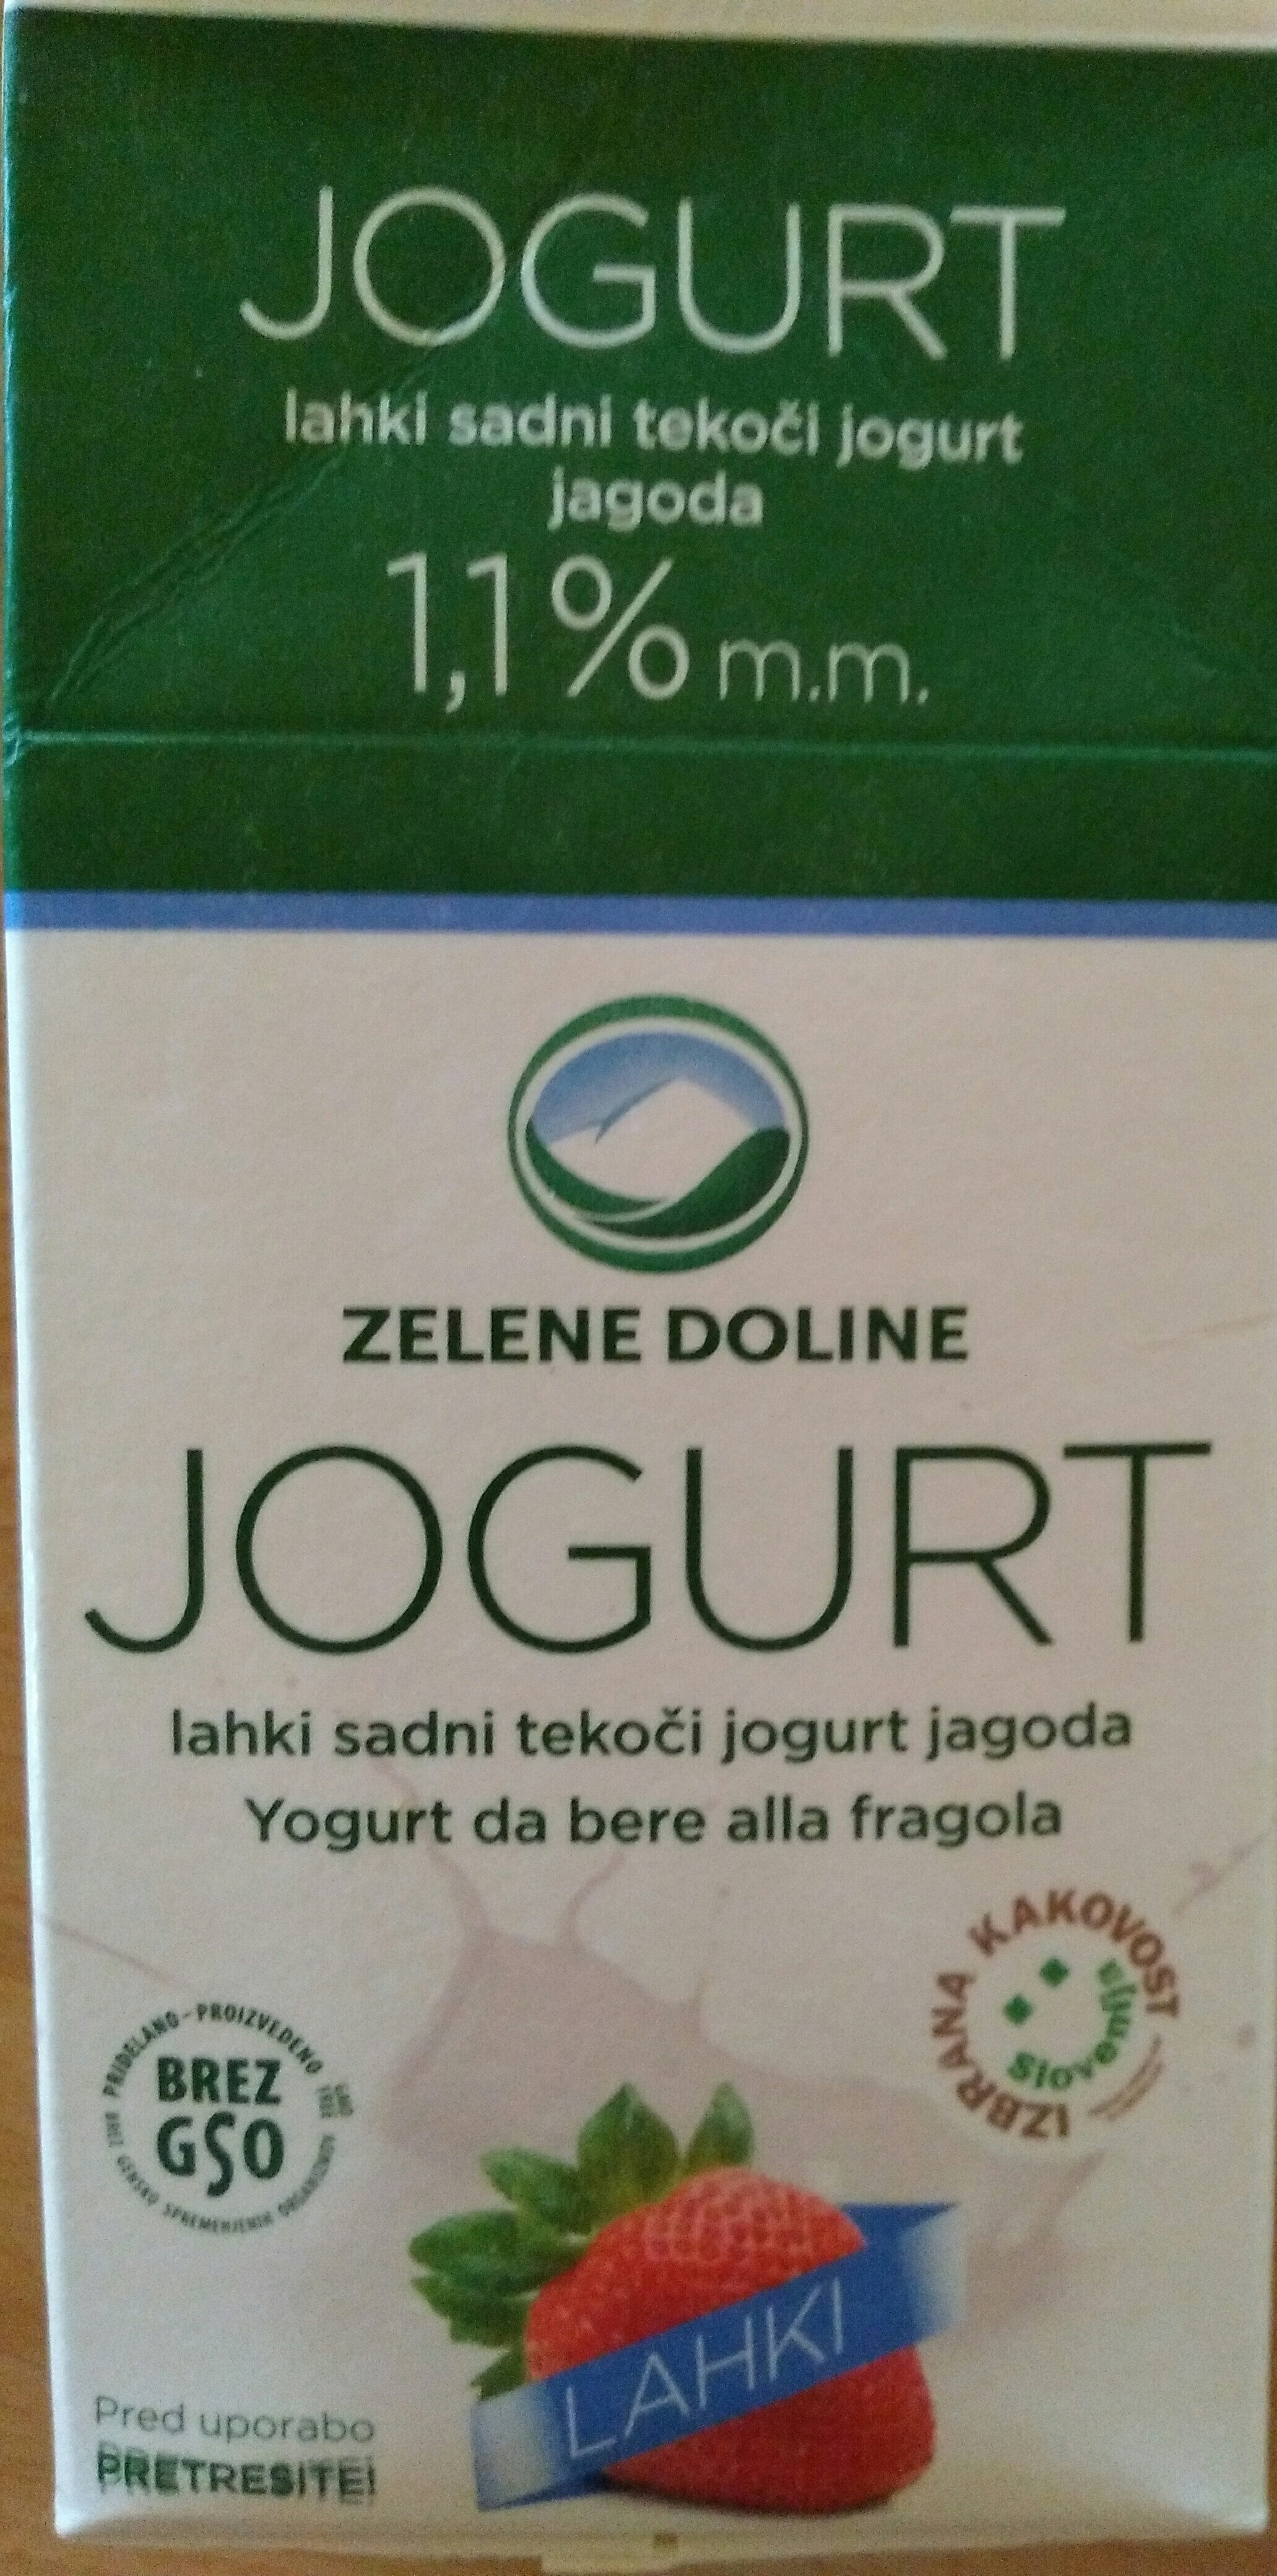 Jogurt jagoda - Product